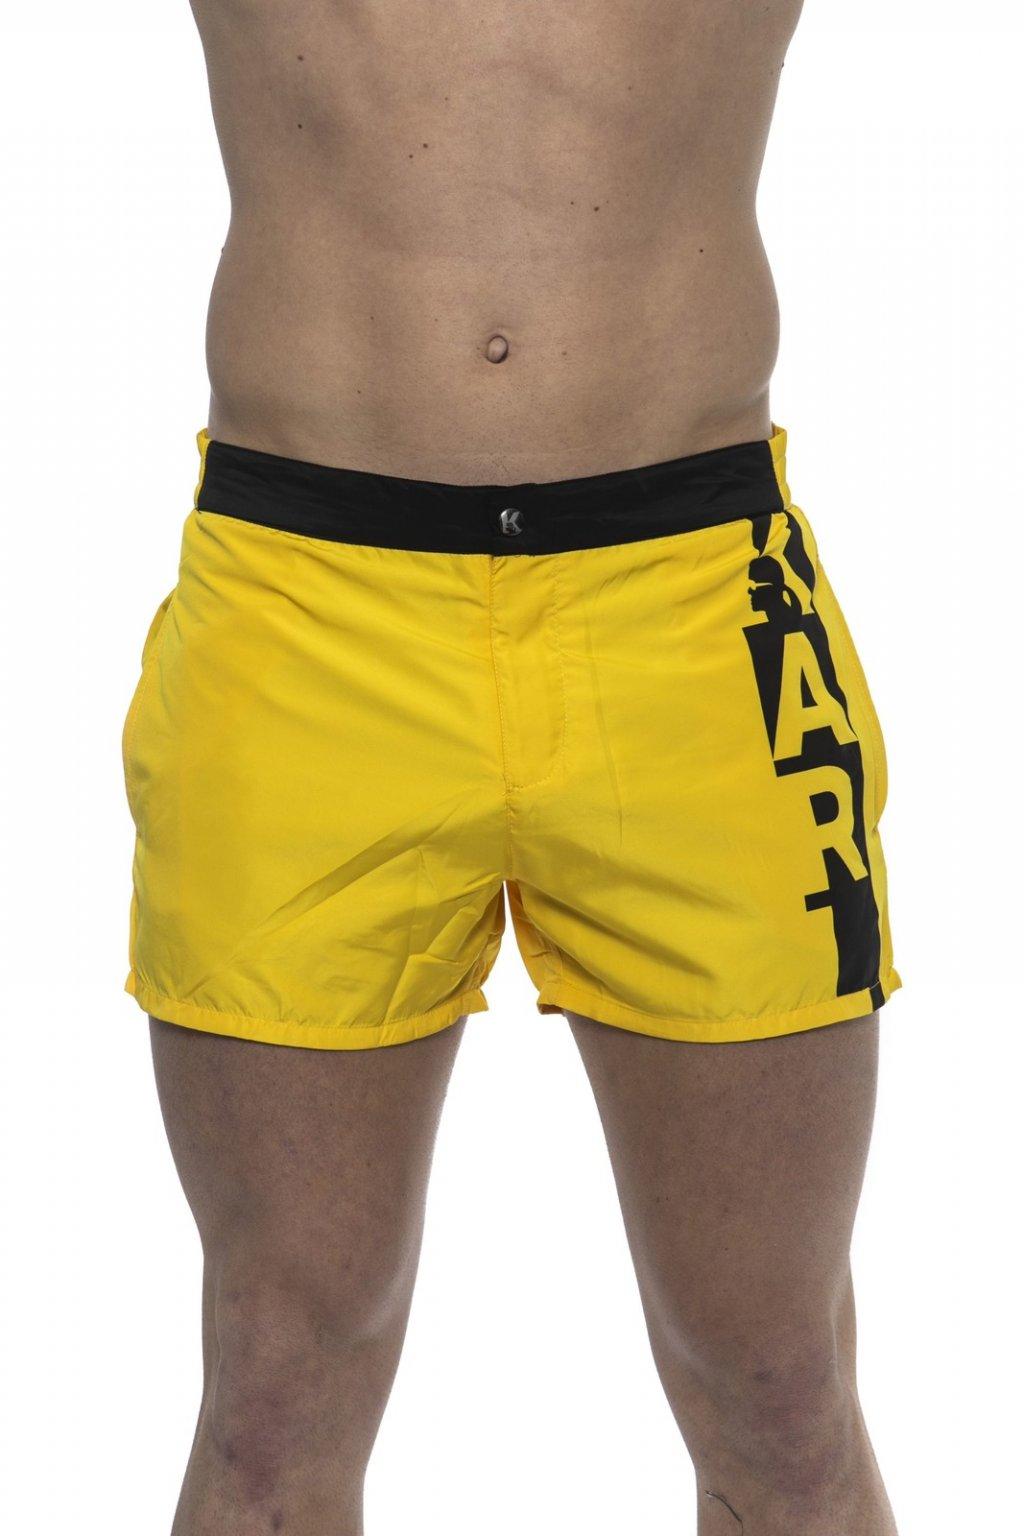 Luxusni plavky Karl Lagerfeld Zluta barva (1)